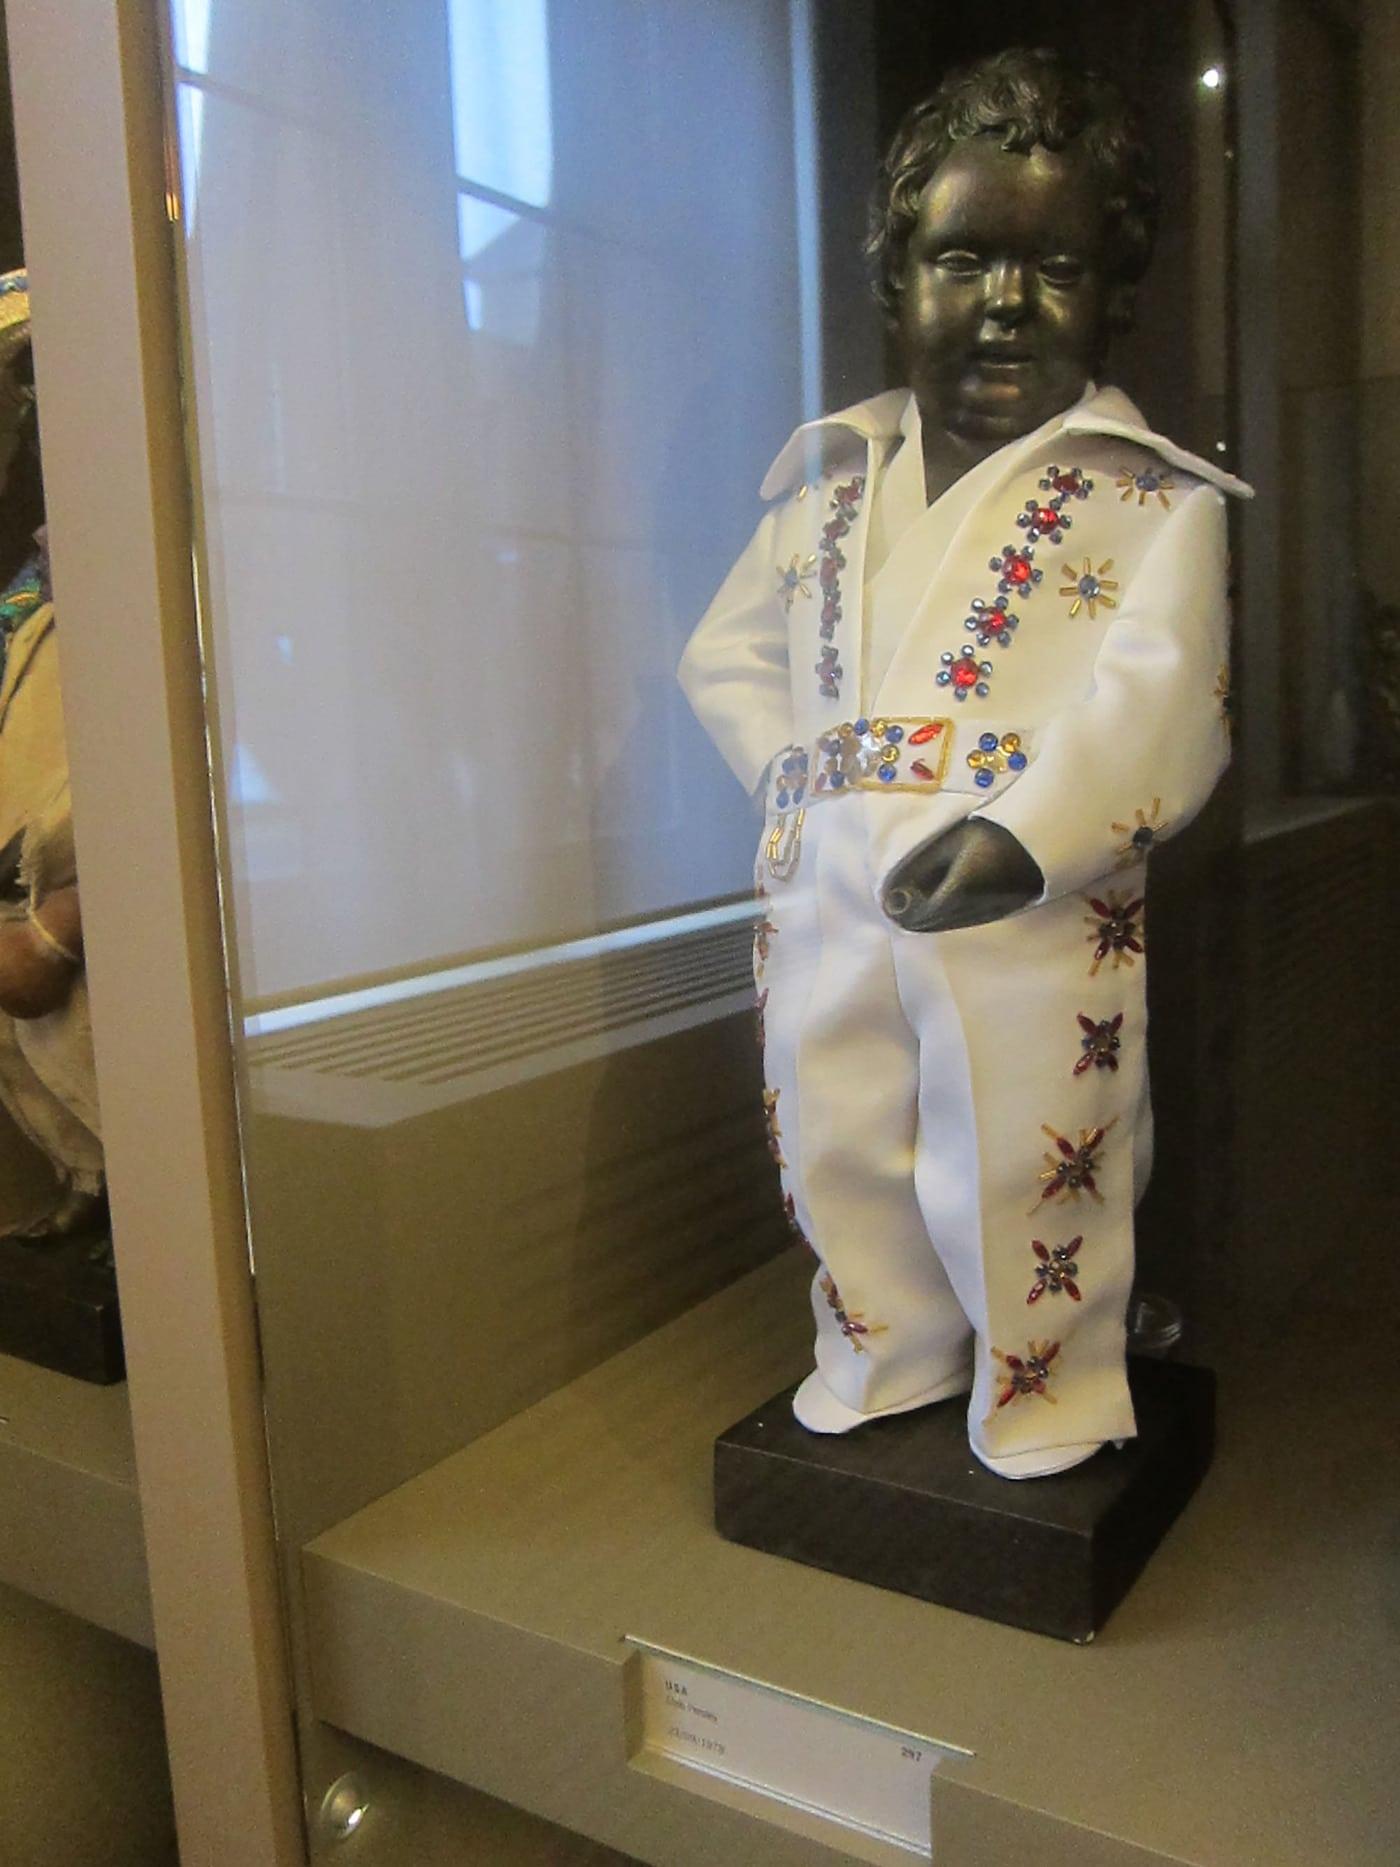 Manneken Pis's wardrobe at the City Museum in Brussels, Belgium